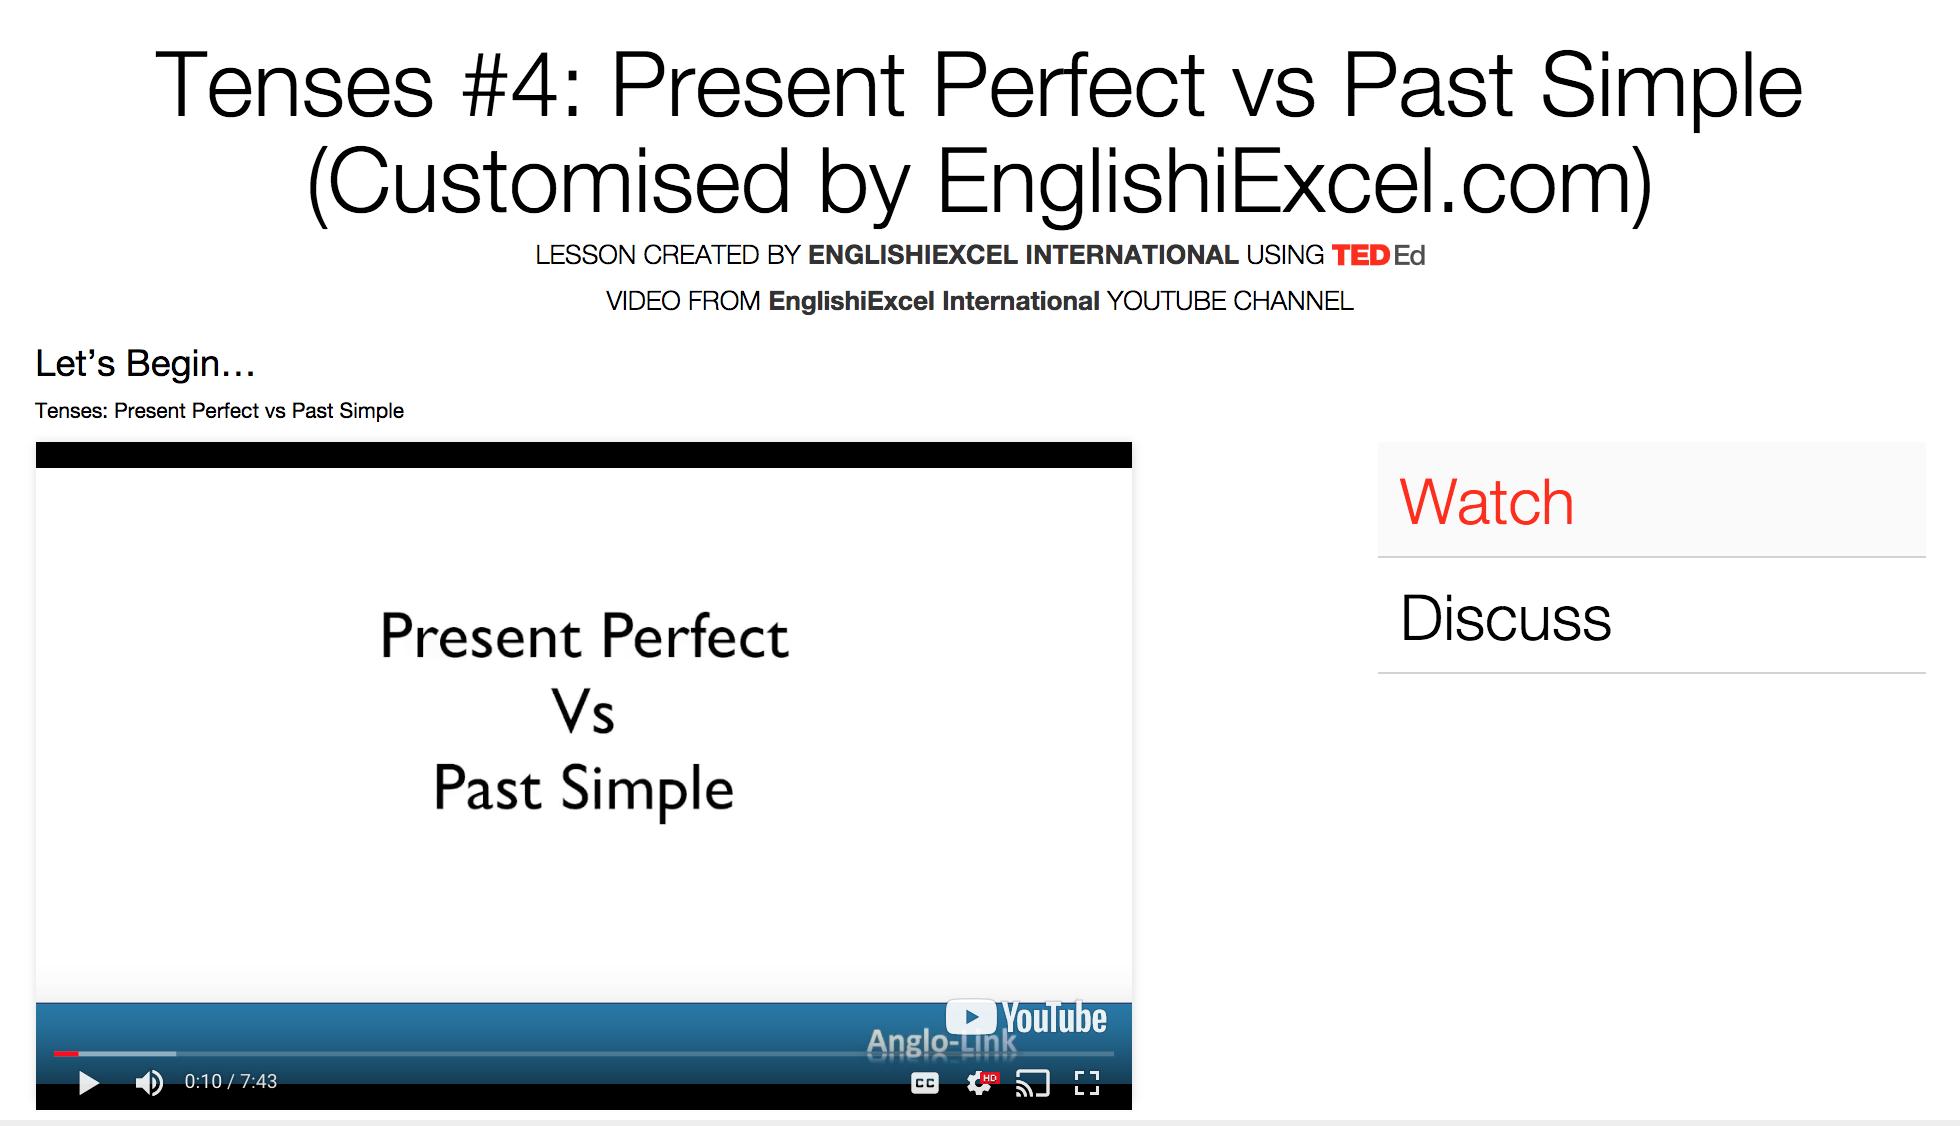 Unit 9: Tenses #4 - Present Perfect vs Past Simple